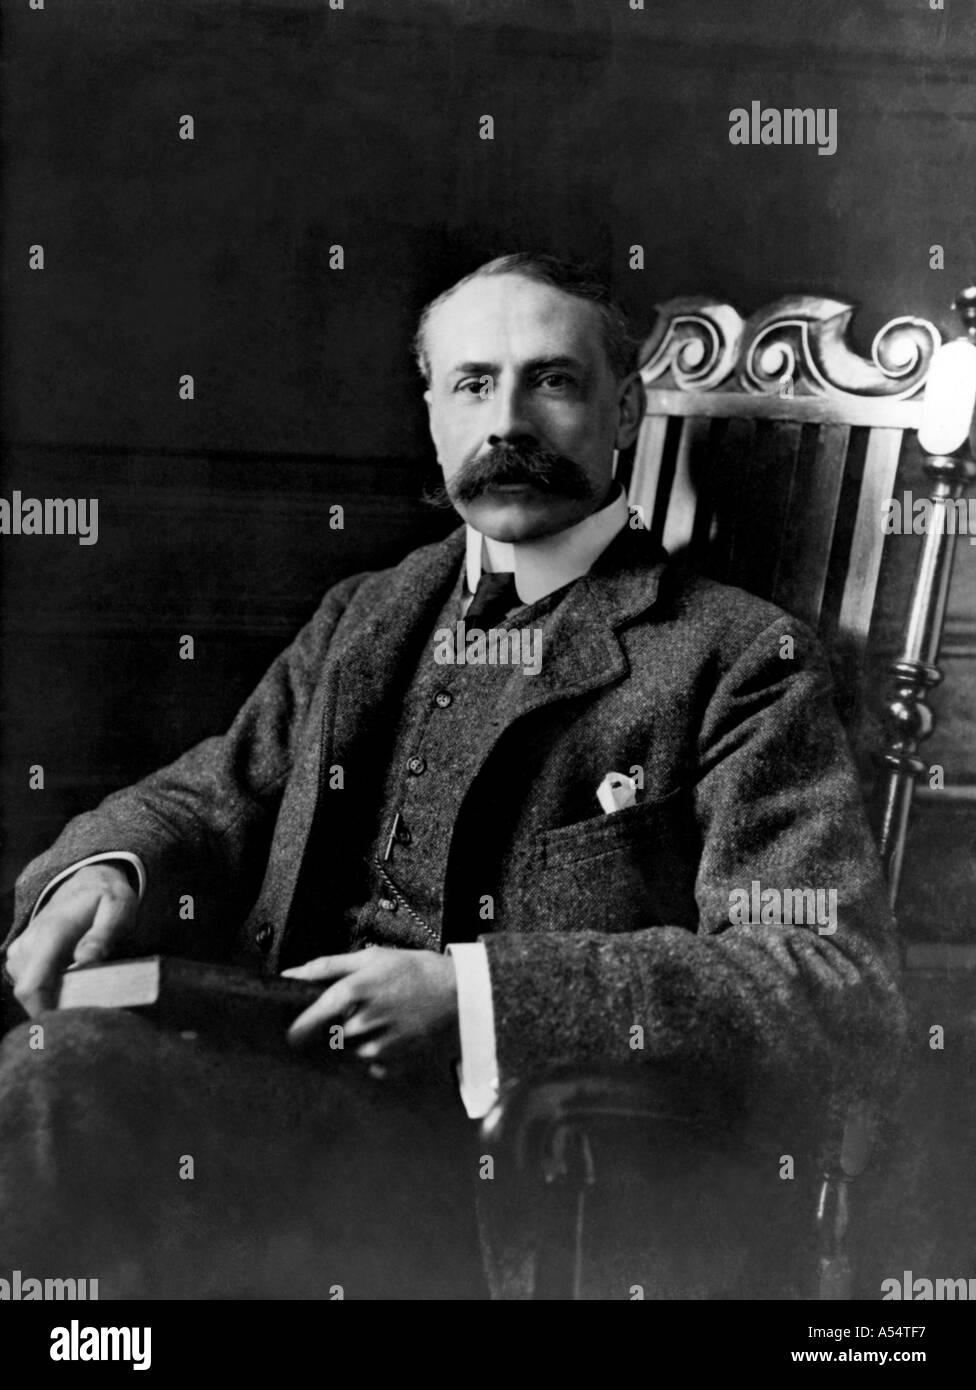 EDWARD ELGAR British composer 1857 1934 - Stock Image